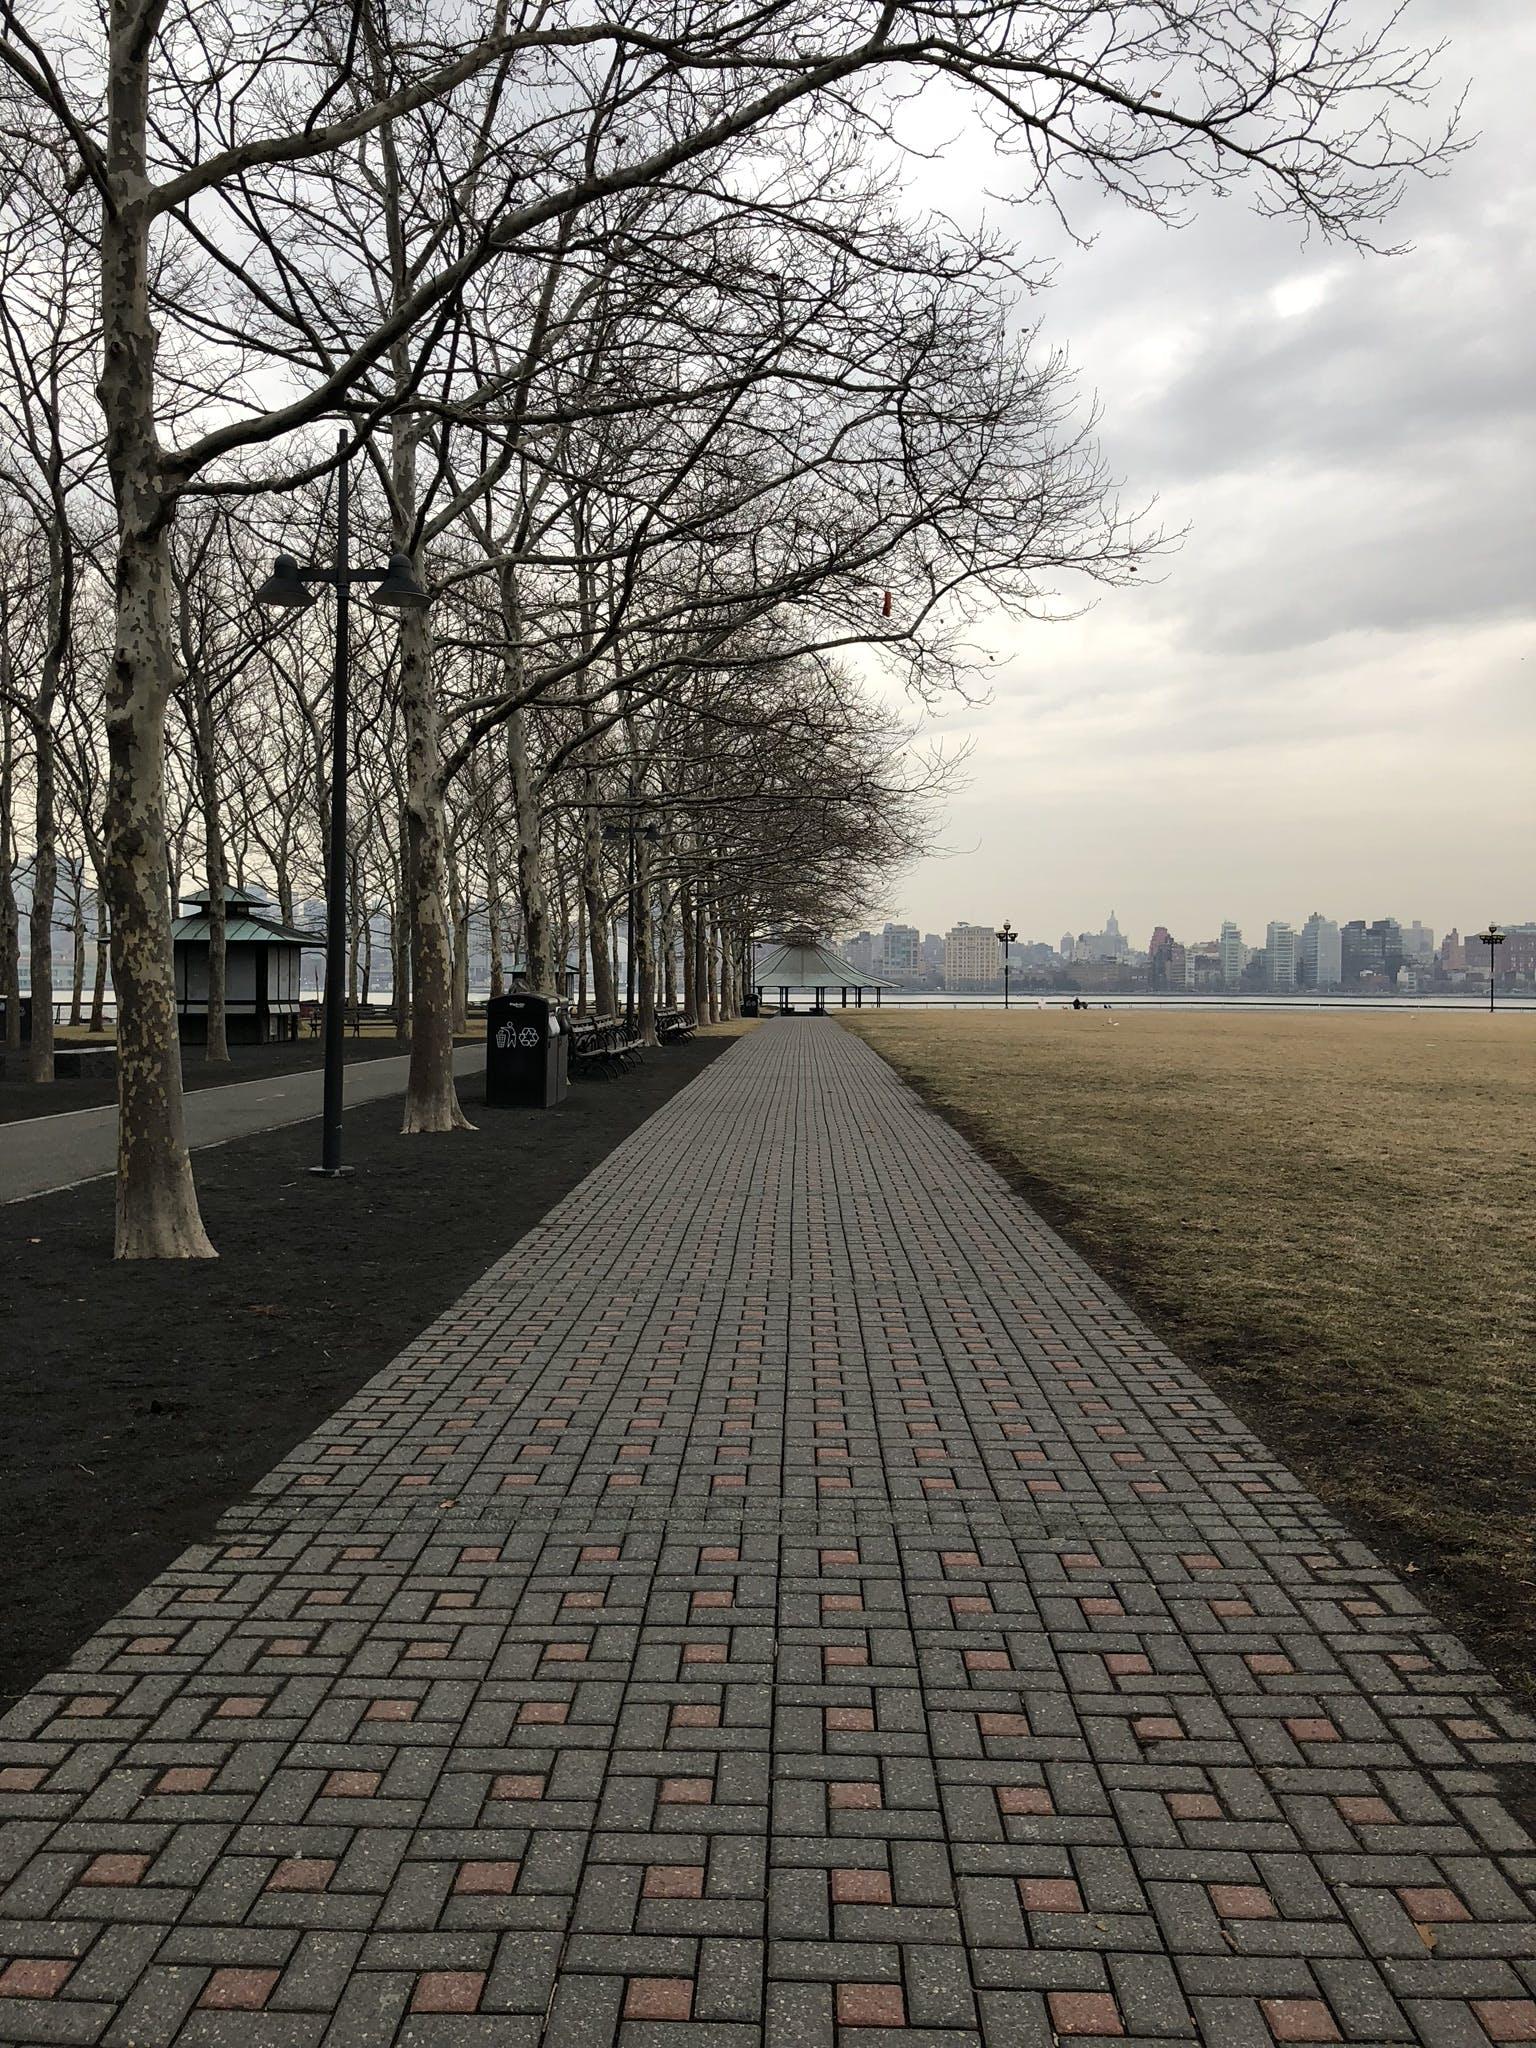 Free stock photo of cloudy, grass, grey, hoboken